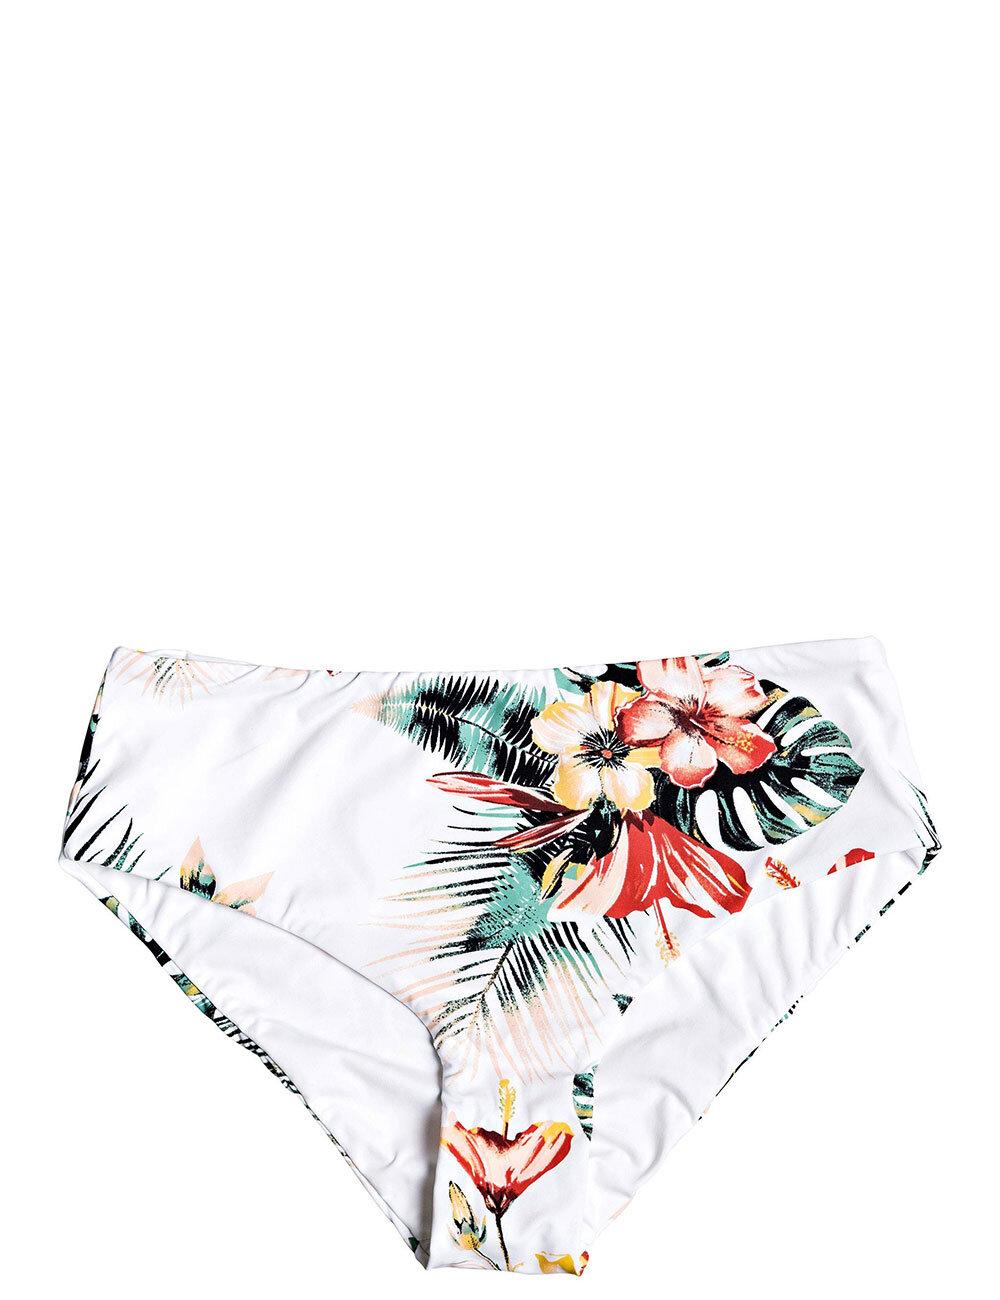 4cedc876be7e4 PRT SOFTLY LOVE FULL MID WAIST BOTTOMS - Women's Swimwear | Bikinis, One  Pieces, Boardshorts & Rash Vests | Surf Wear NZ - ROXY S18